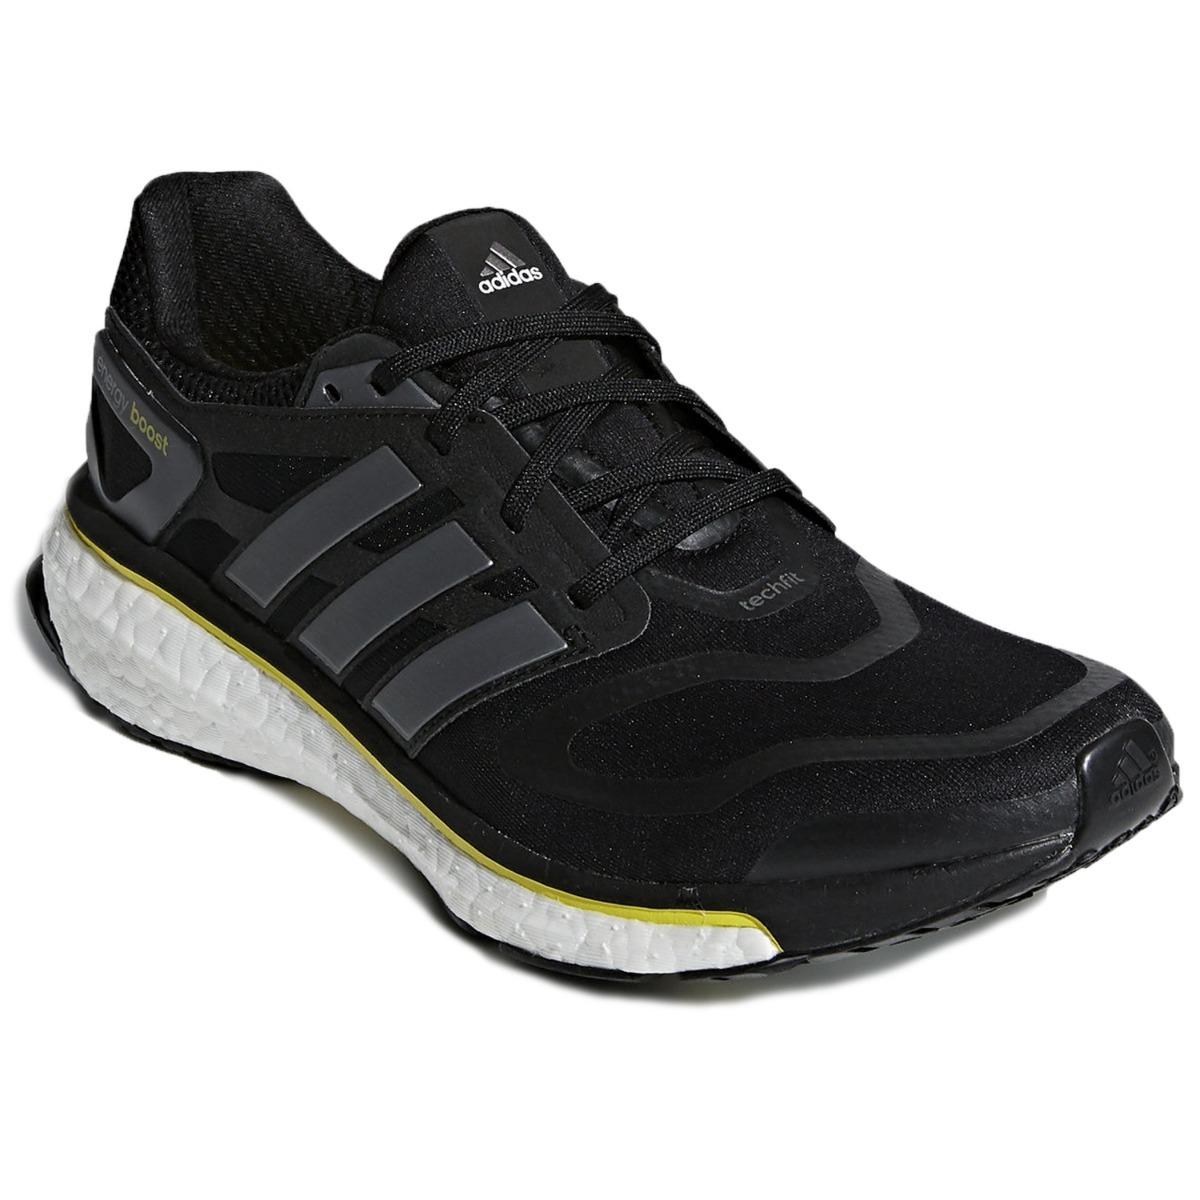 039750a846 tenis adidas energy boost negro correr running. Cargando zoom.